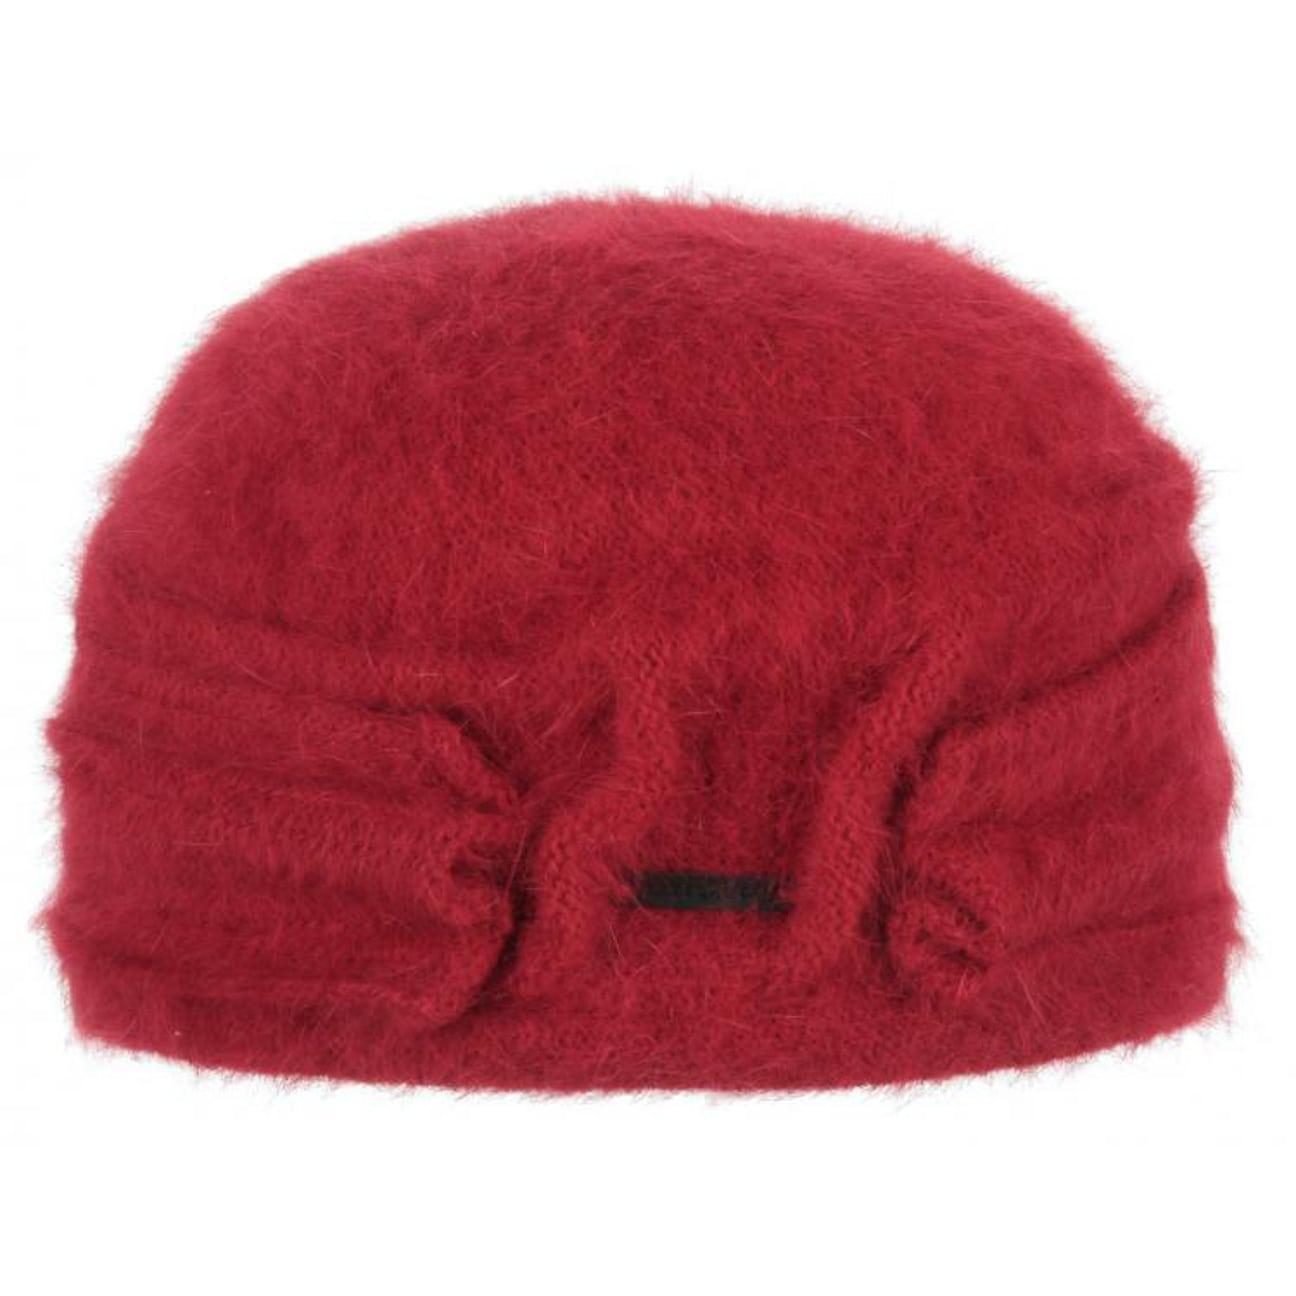 889b7d68a16 ... Nakiska Angora Toque Hat by Seeberger - red 1 ...